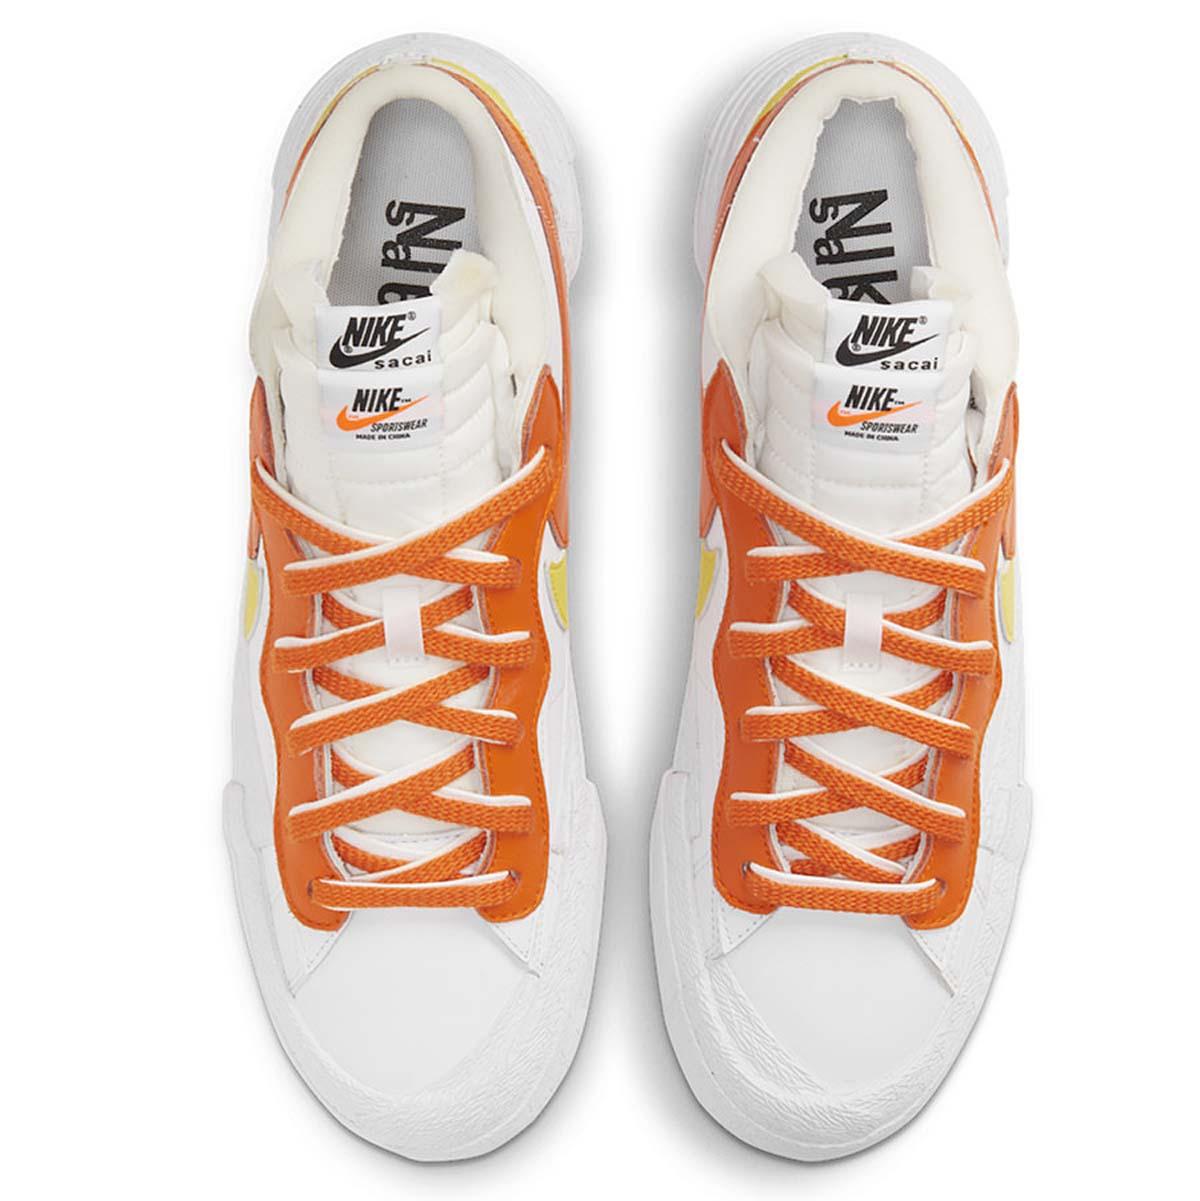 sacai x NIKE BLAZER LOW WHITE / MAGMA ORANGE-WHITE DD1877-100 サカイ × ナイキ ブレザー ロー ホワイト/マグマオレンジ